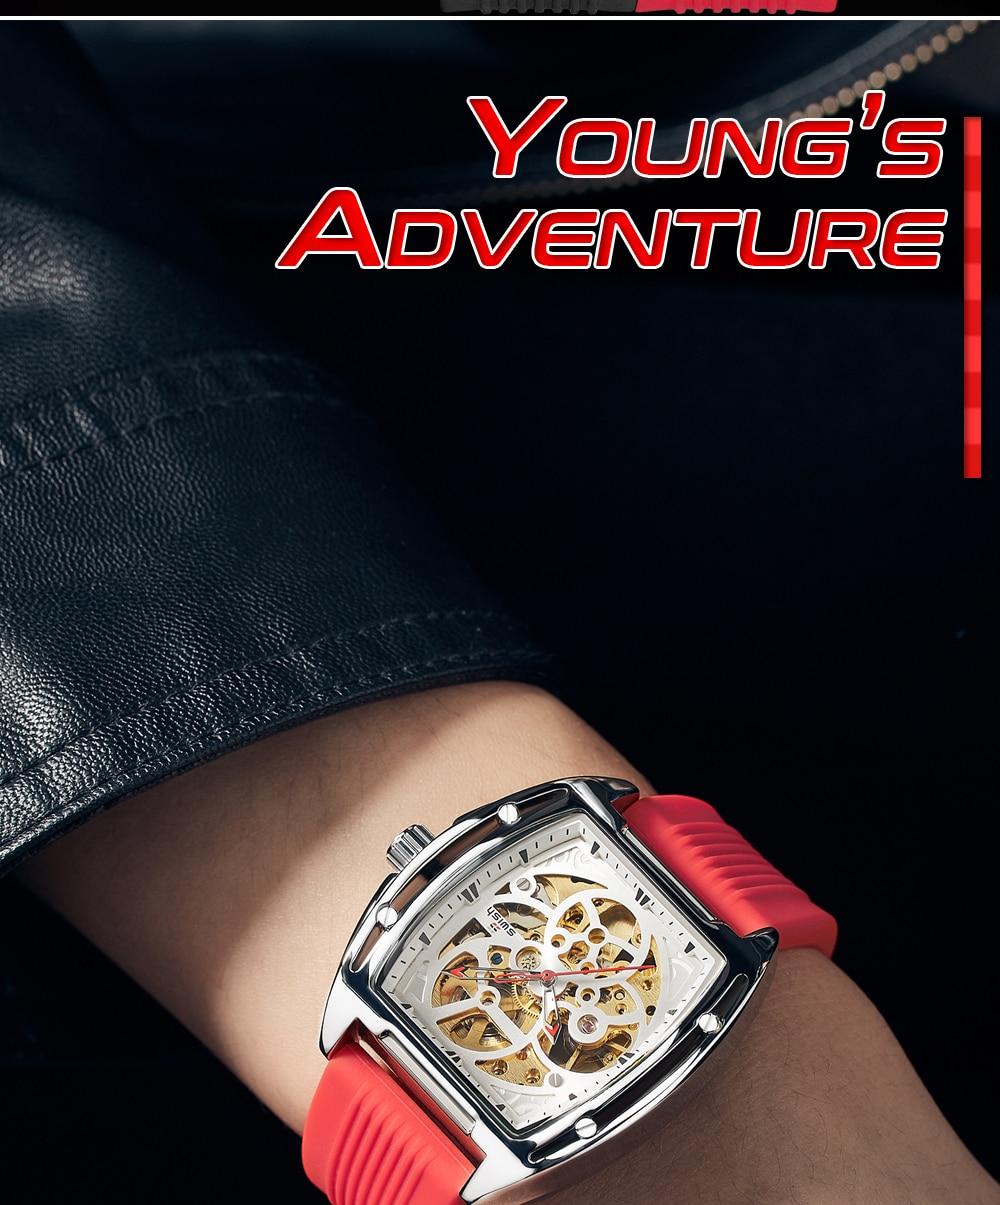 Hab224c40b6124f99bbc349040ef4fec87 SWISH Brand Design Luxury Men's Mechanical Wristwatch